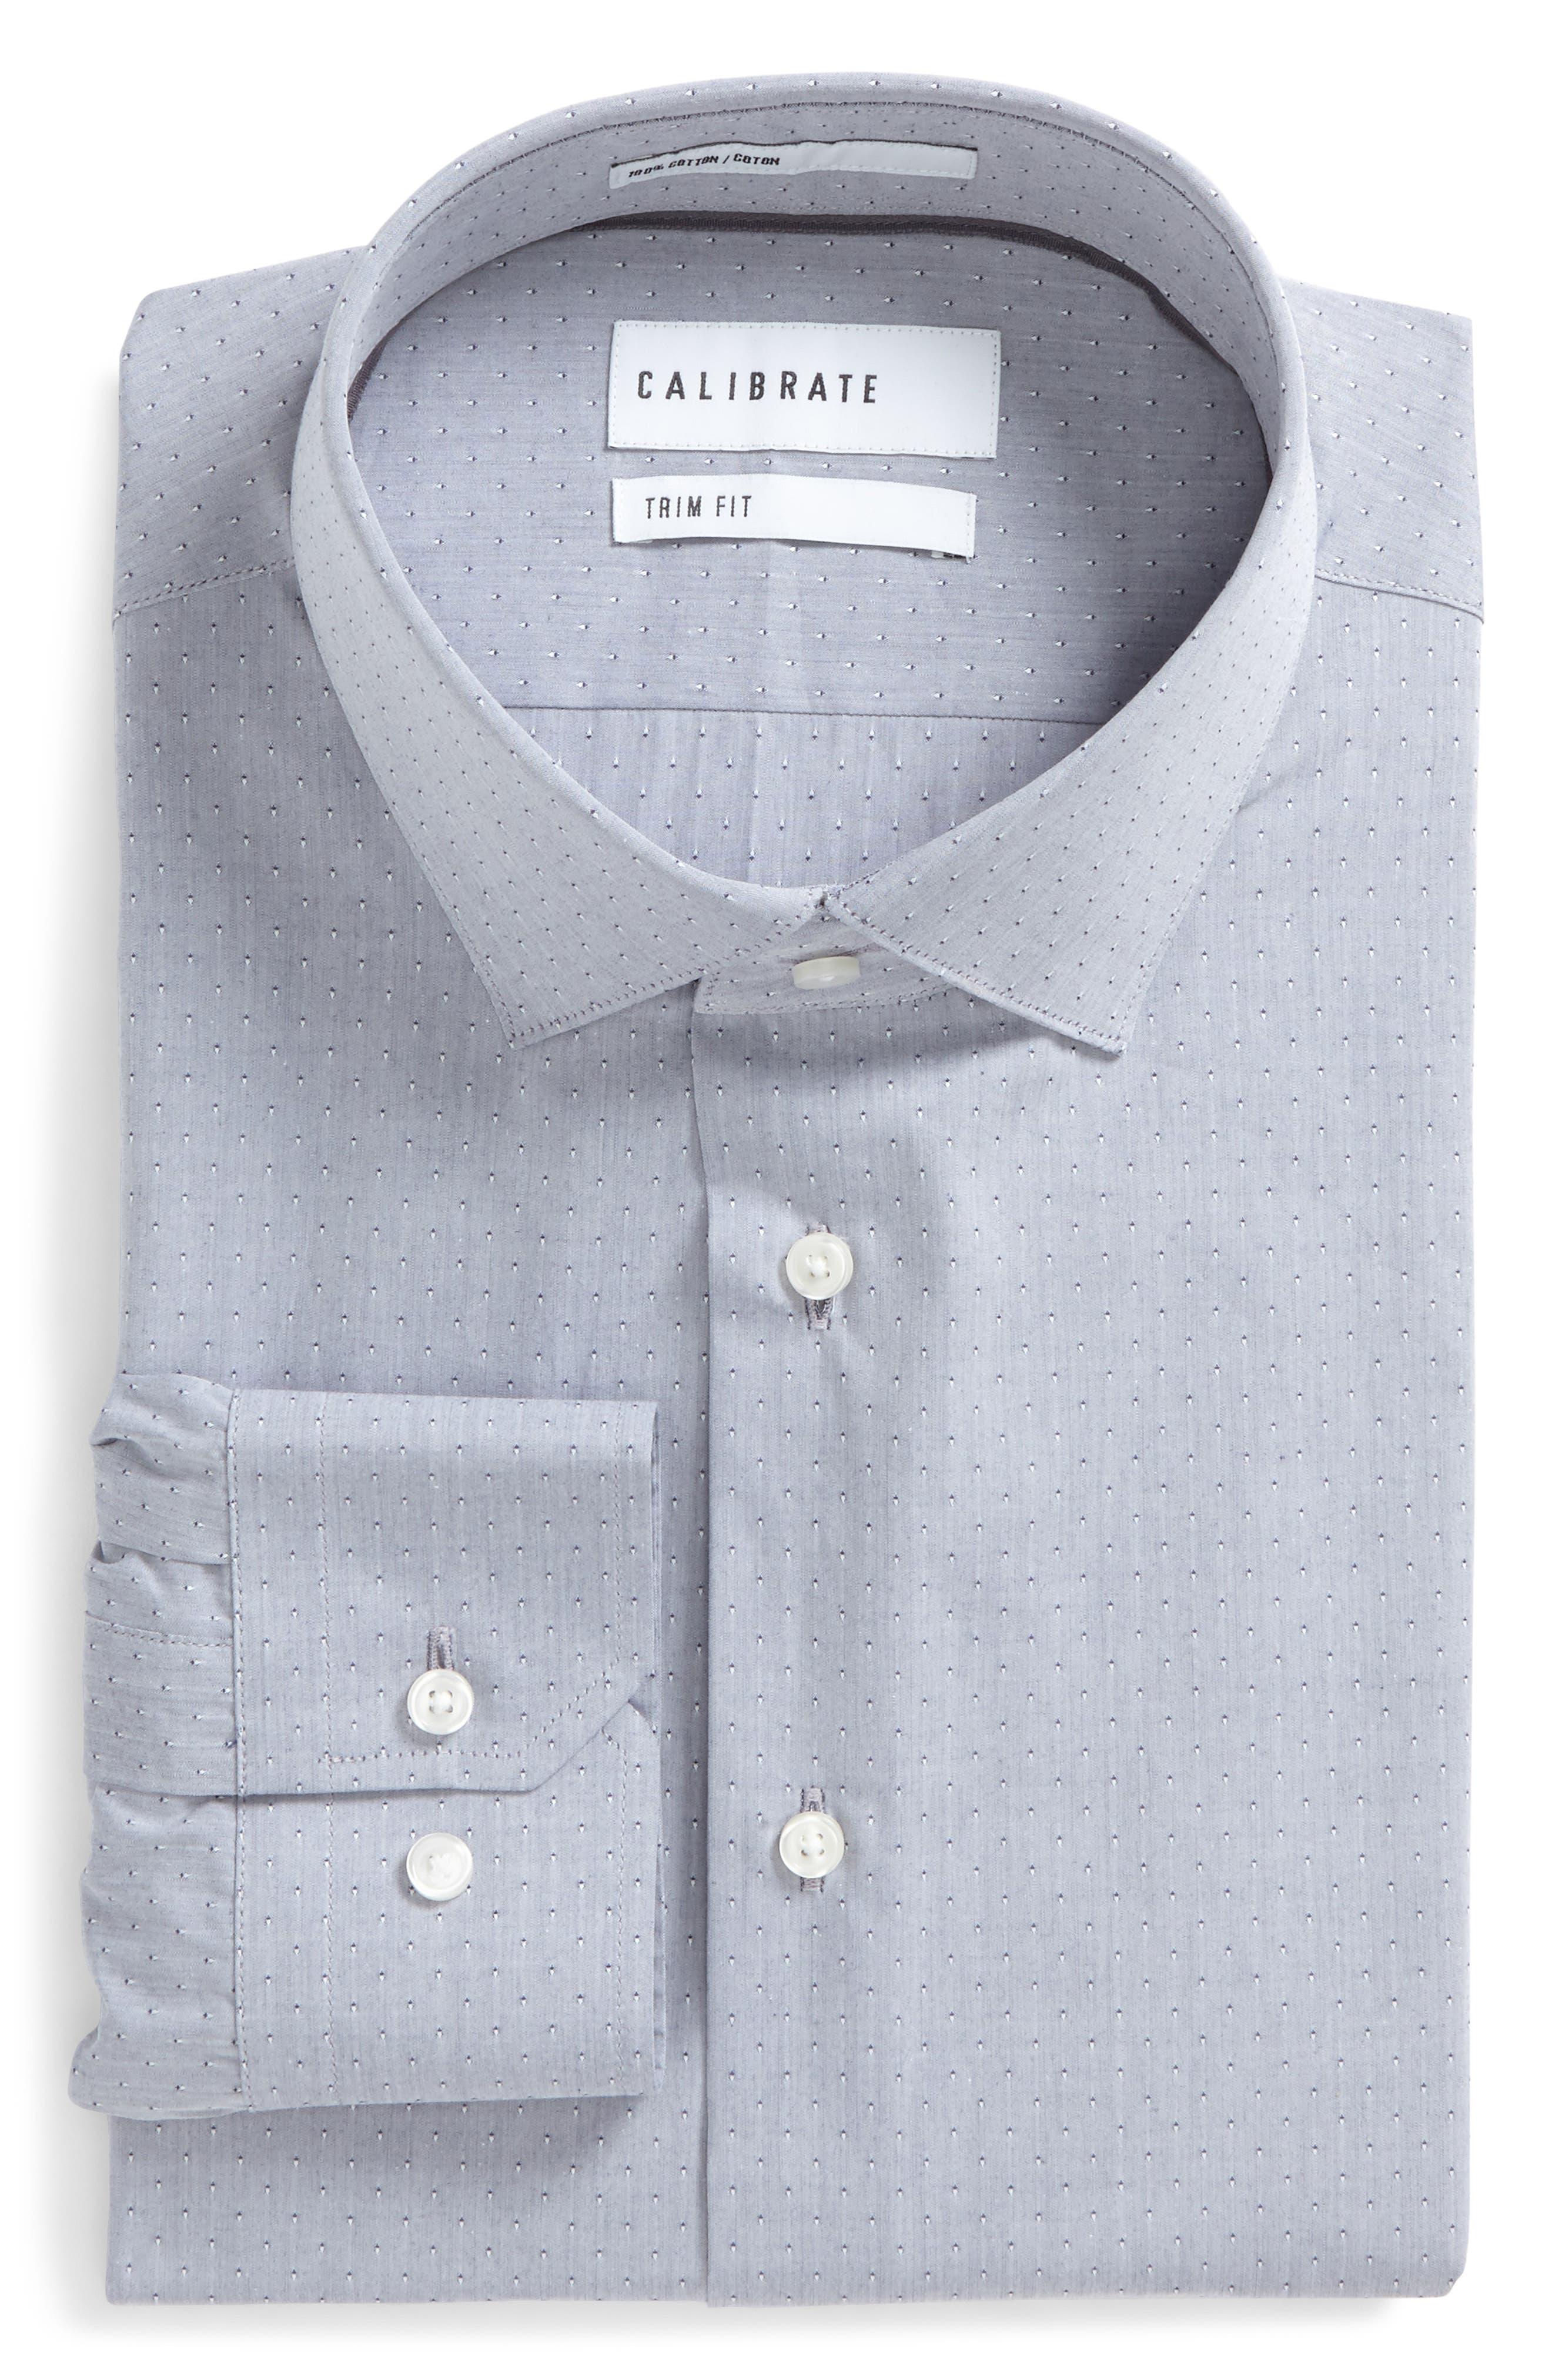 Main Image - Calibrate Trim Fit Dobby Dress Shirt